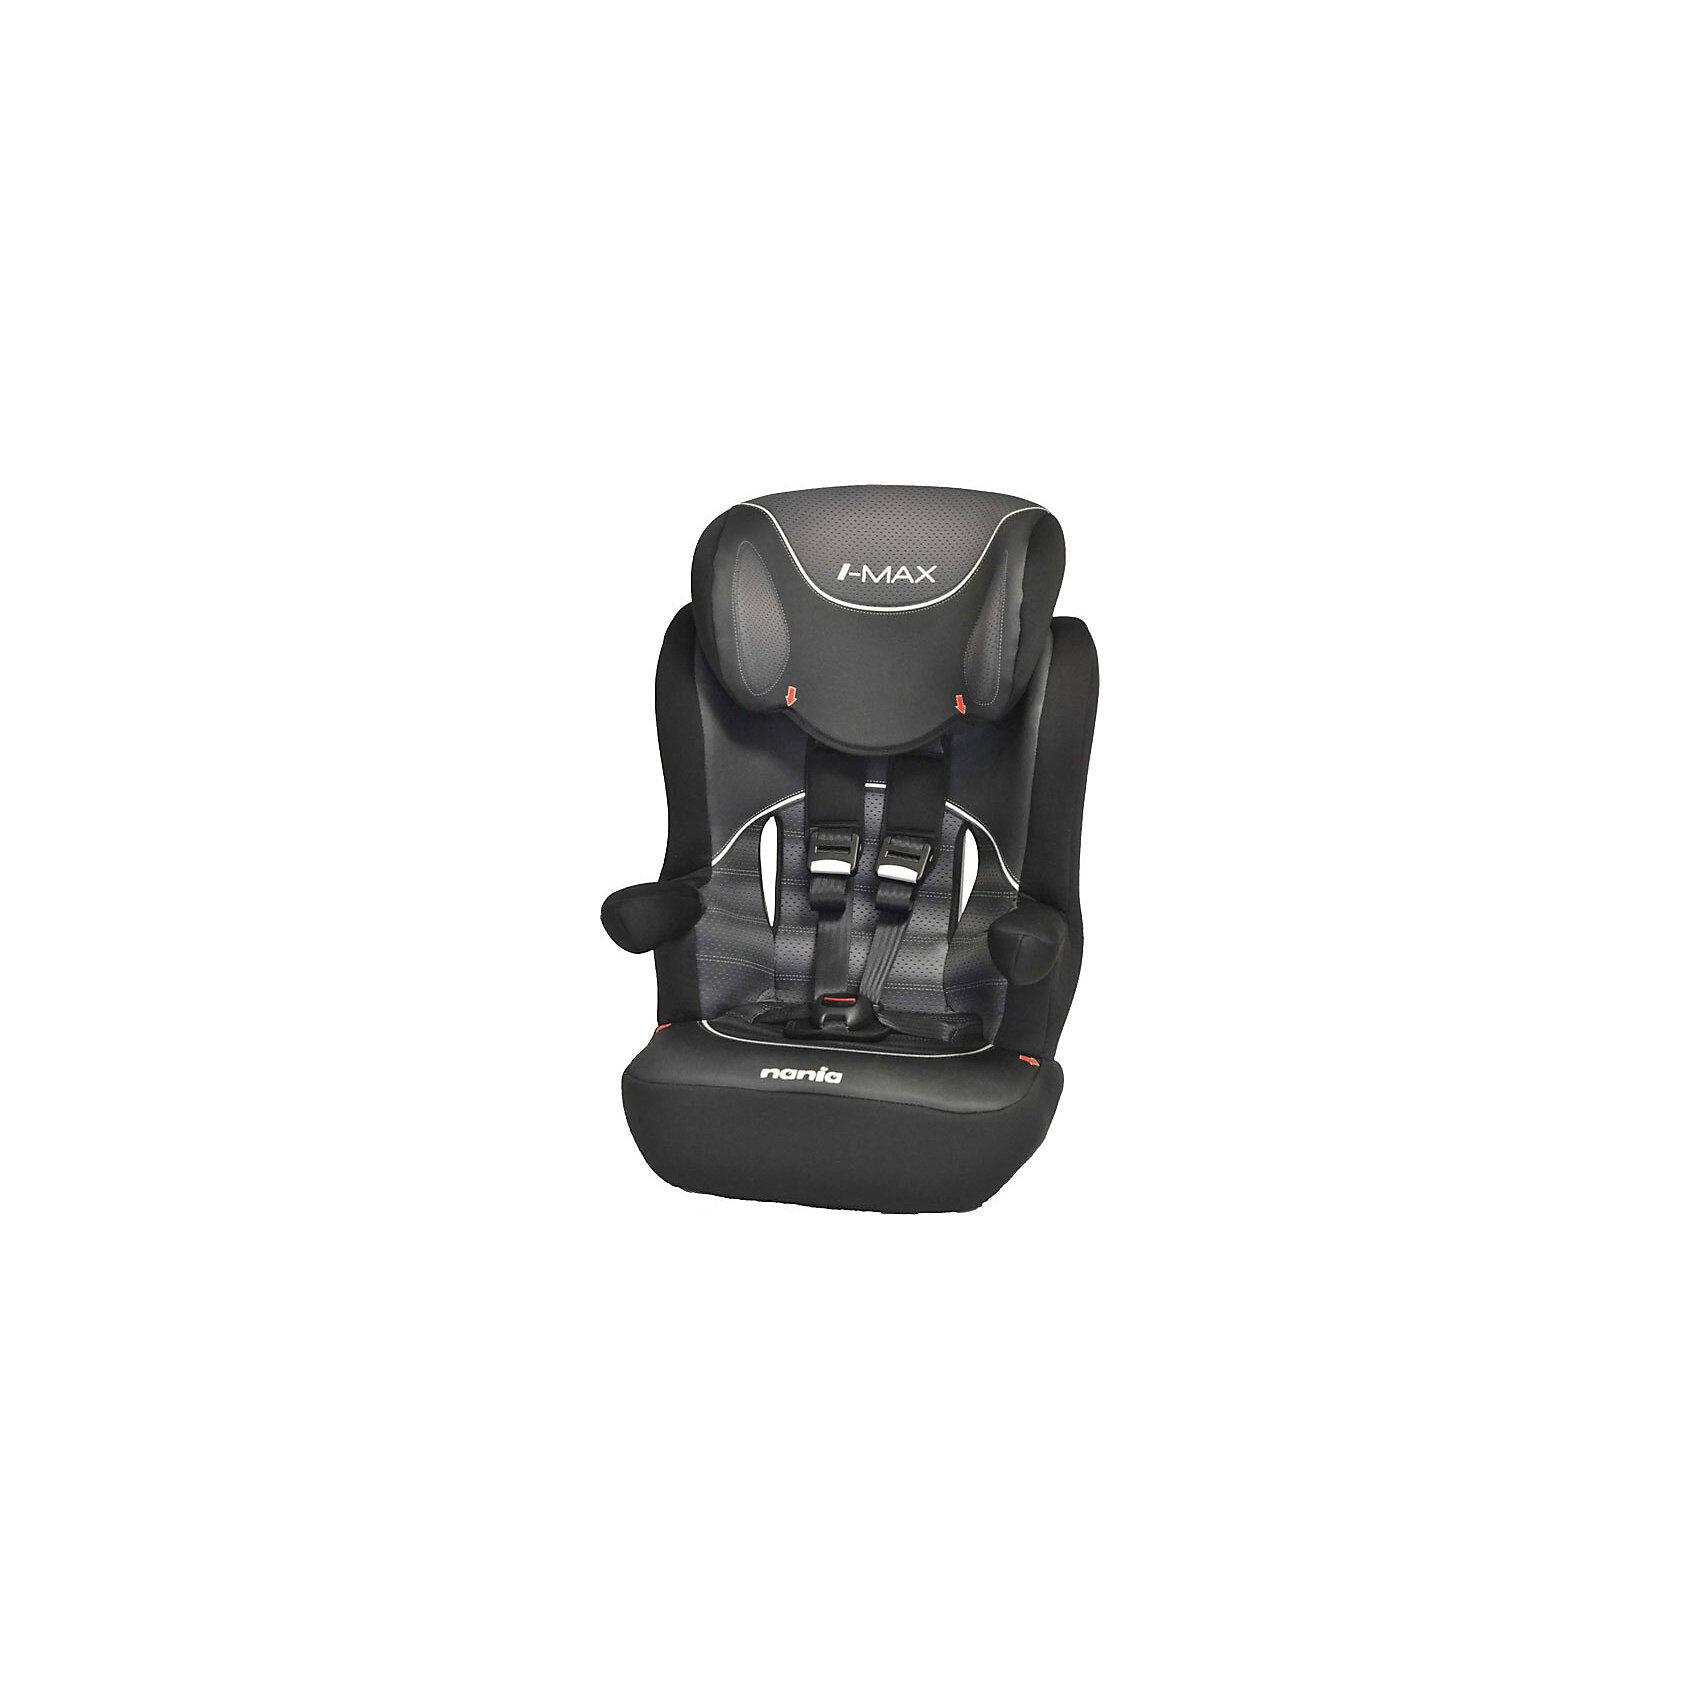 Автокресло Nania Imax SP FST 9-36 кг, graphic black